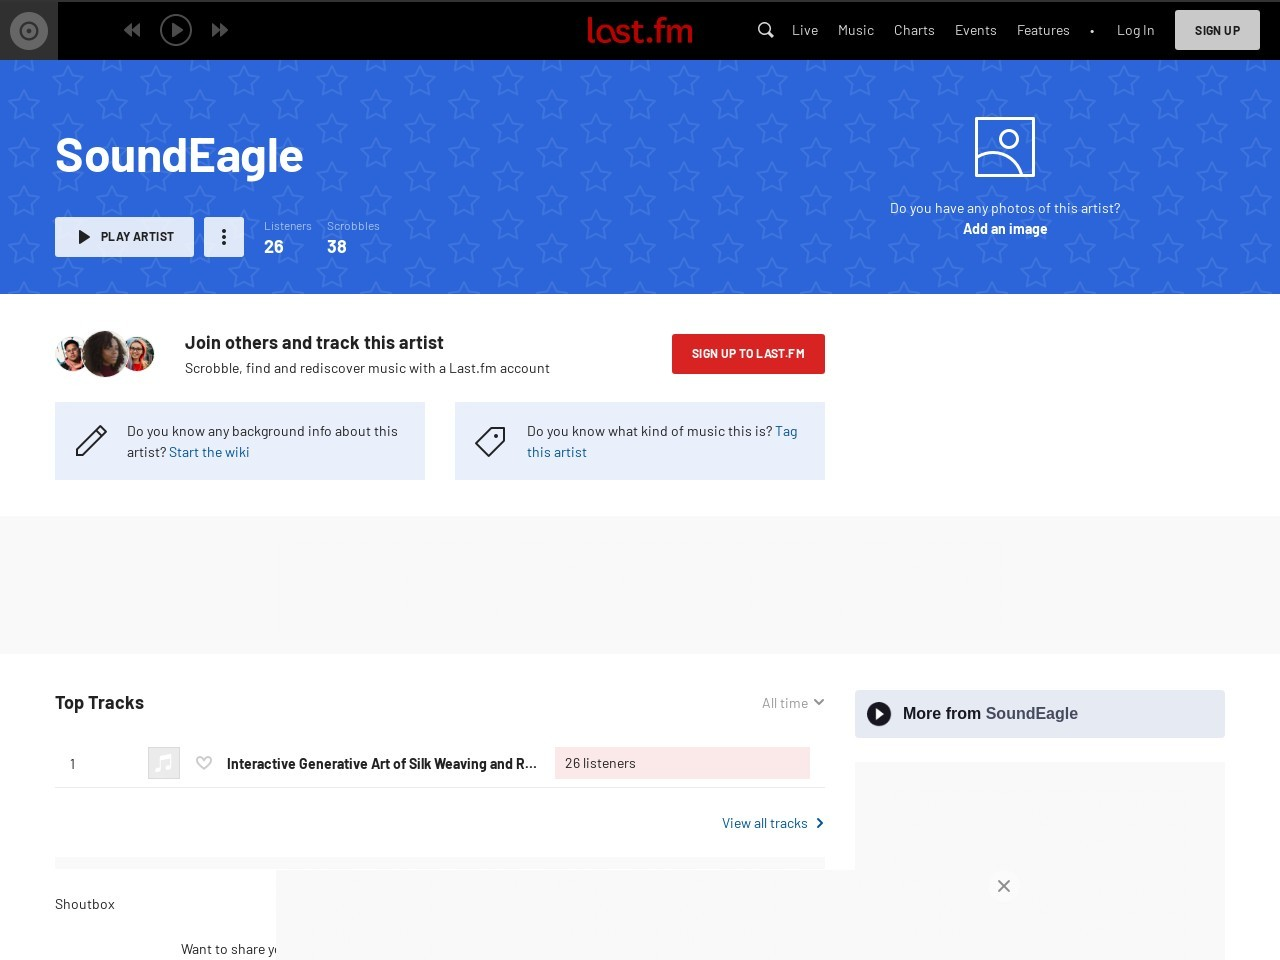 SoundEagle on Last.fm Music